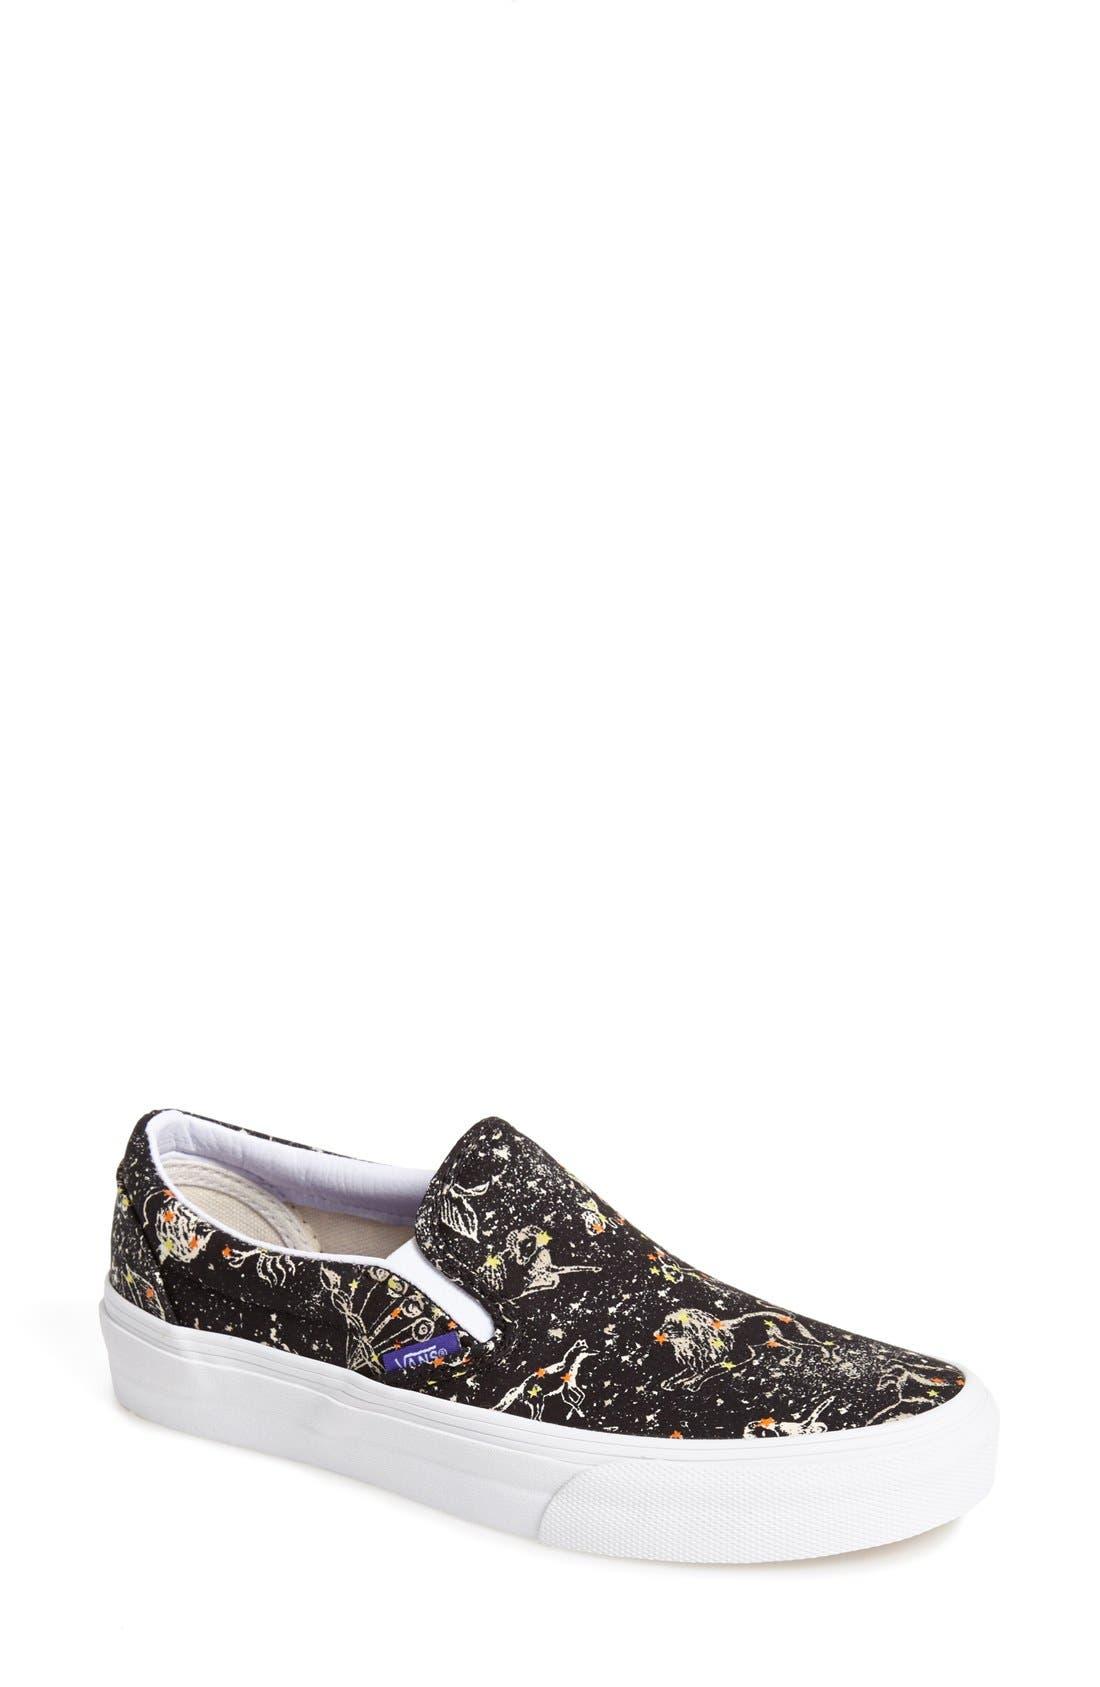 Main Image - Liberty x Vans 'Classic' Slip-On Sneaker (Women)